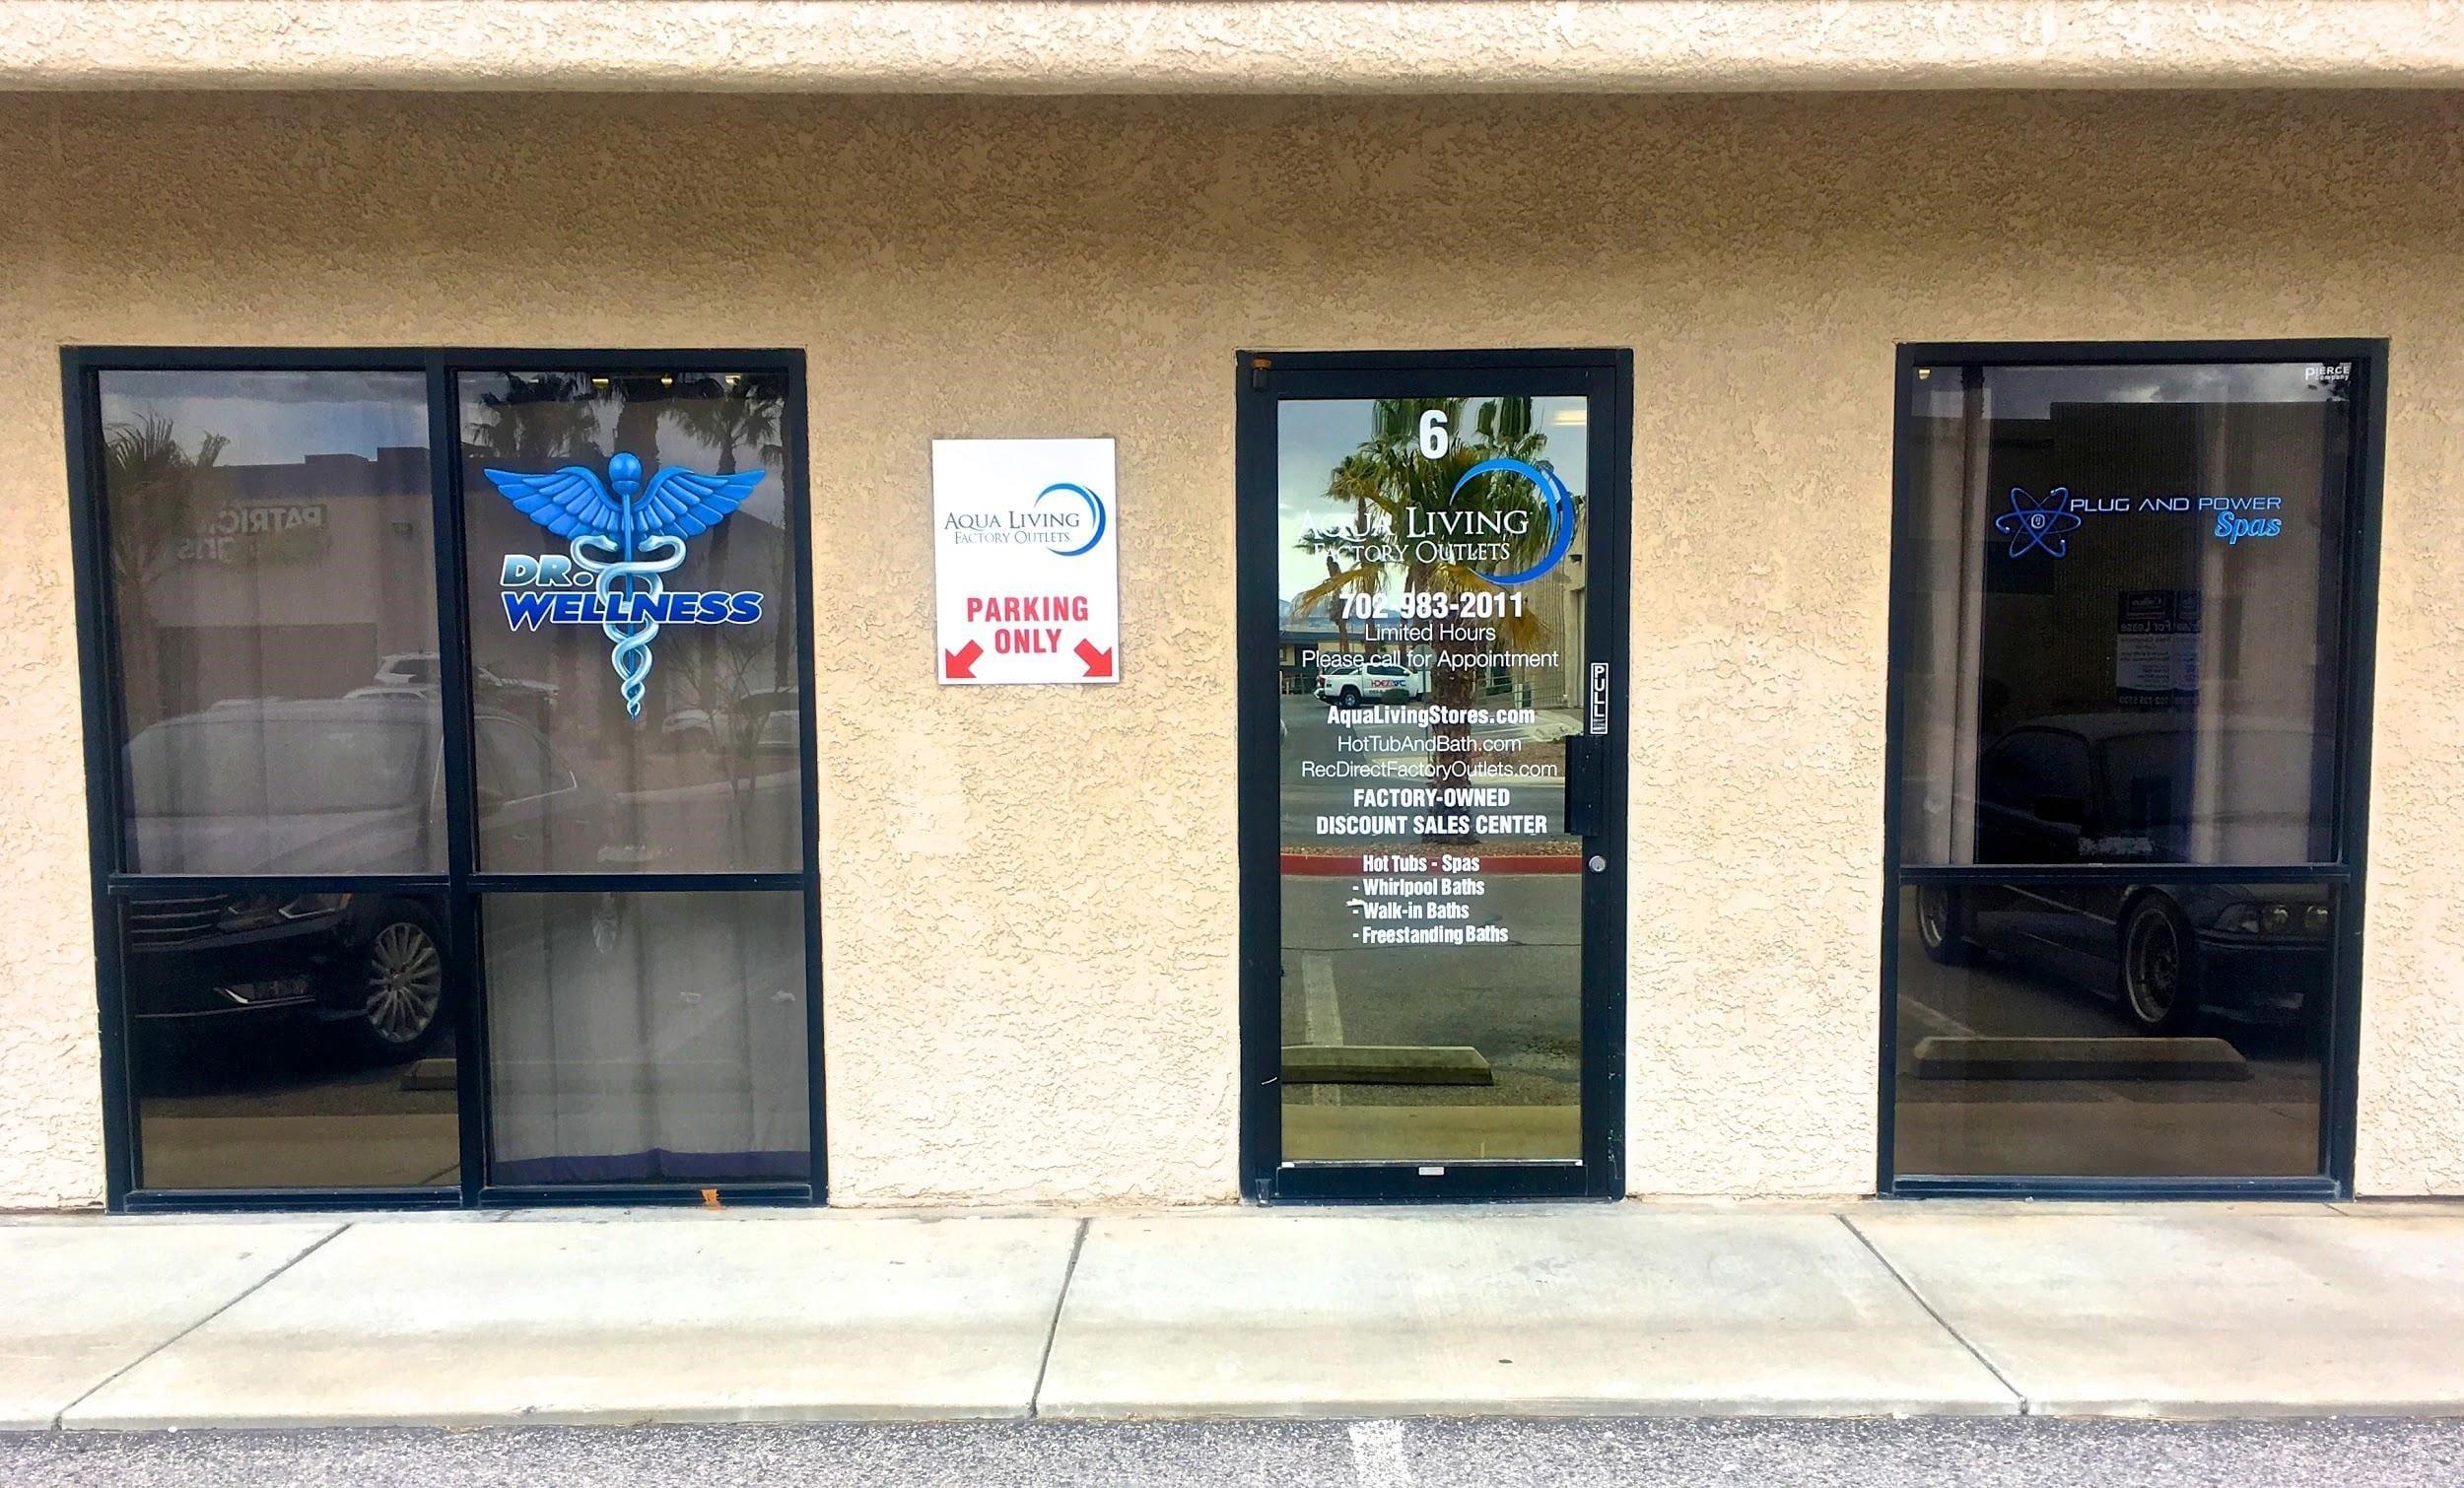 Las Vegas, NV - Saunas, Spas, Hot Tubs - Aqua Living Factory Outlets